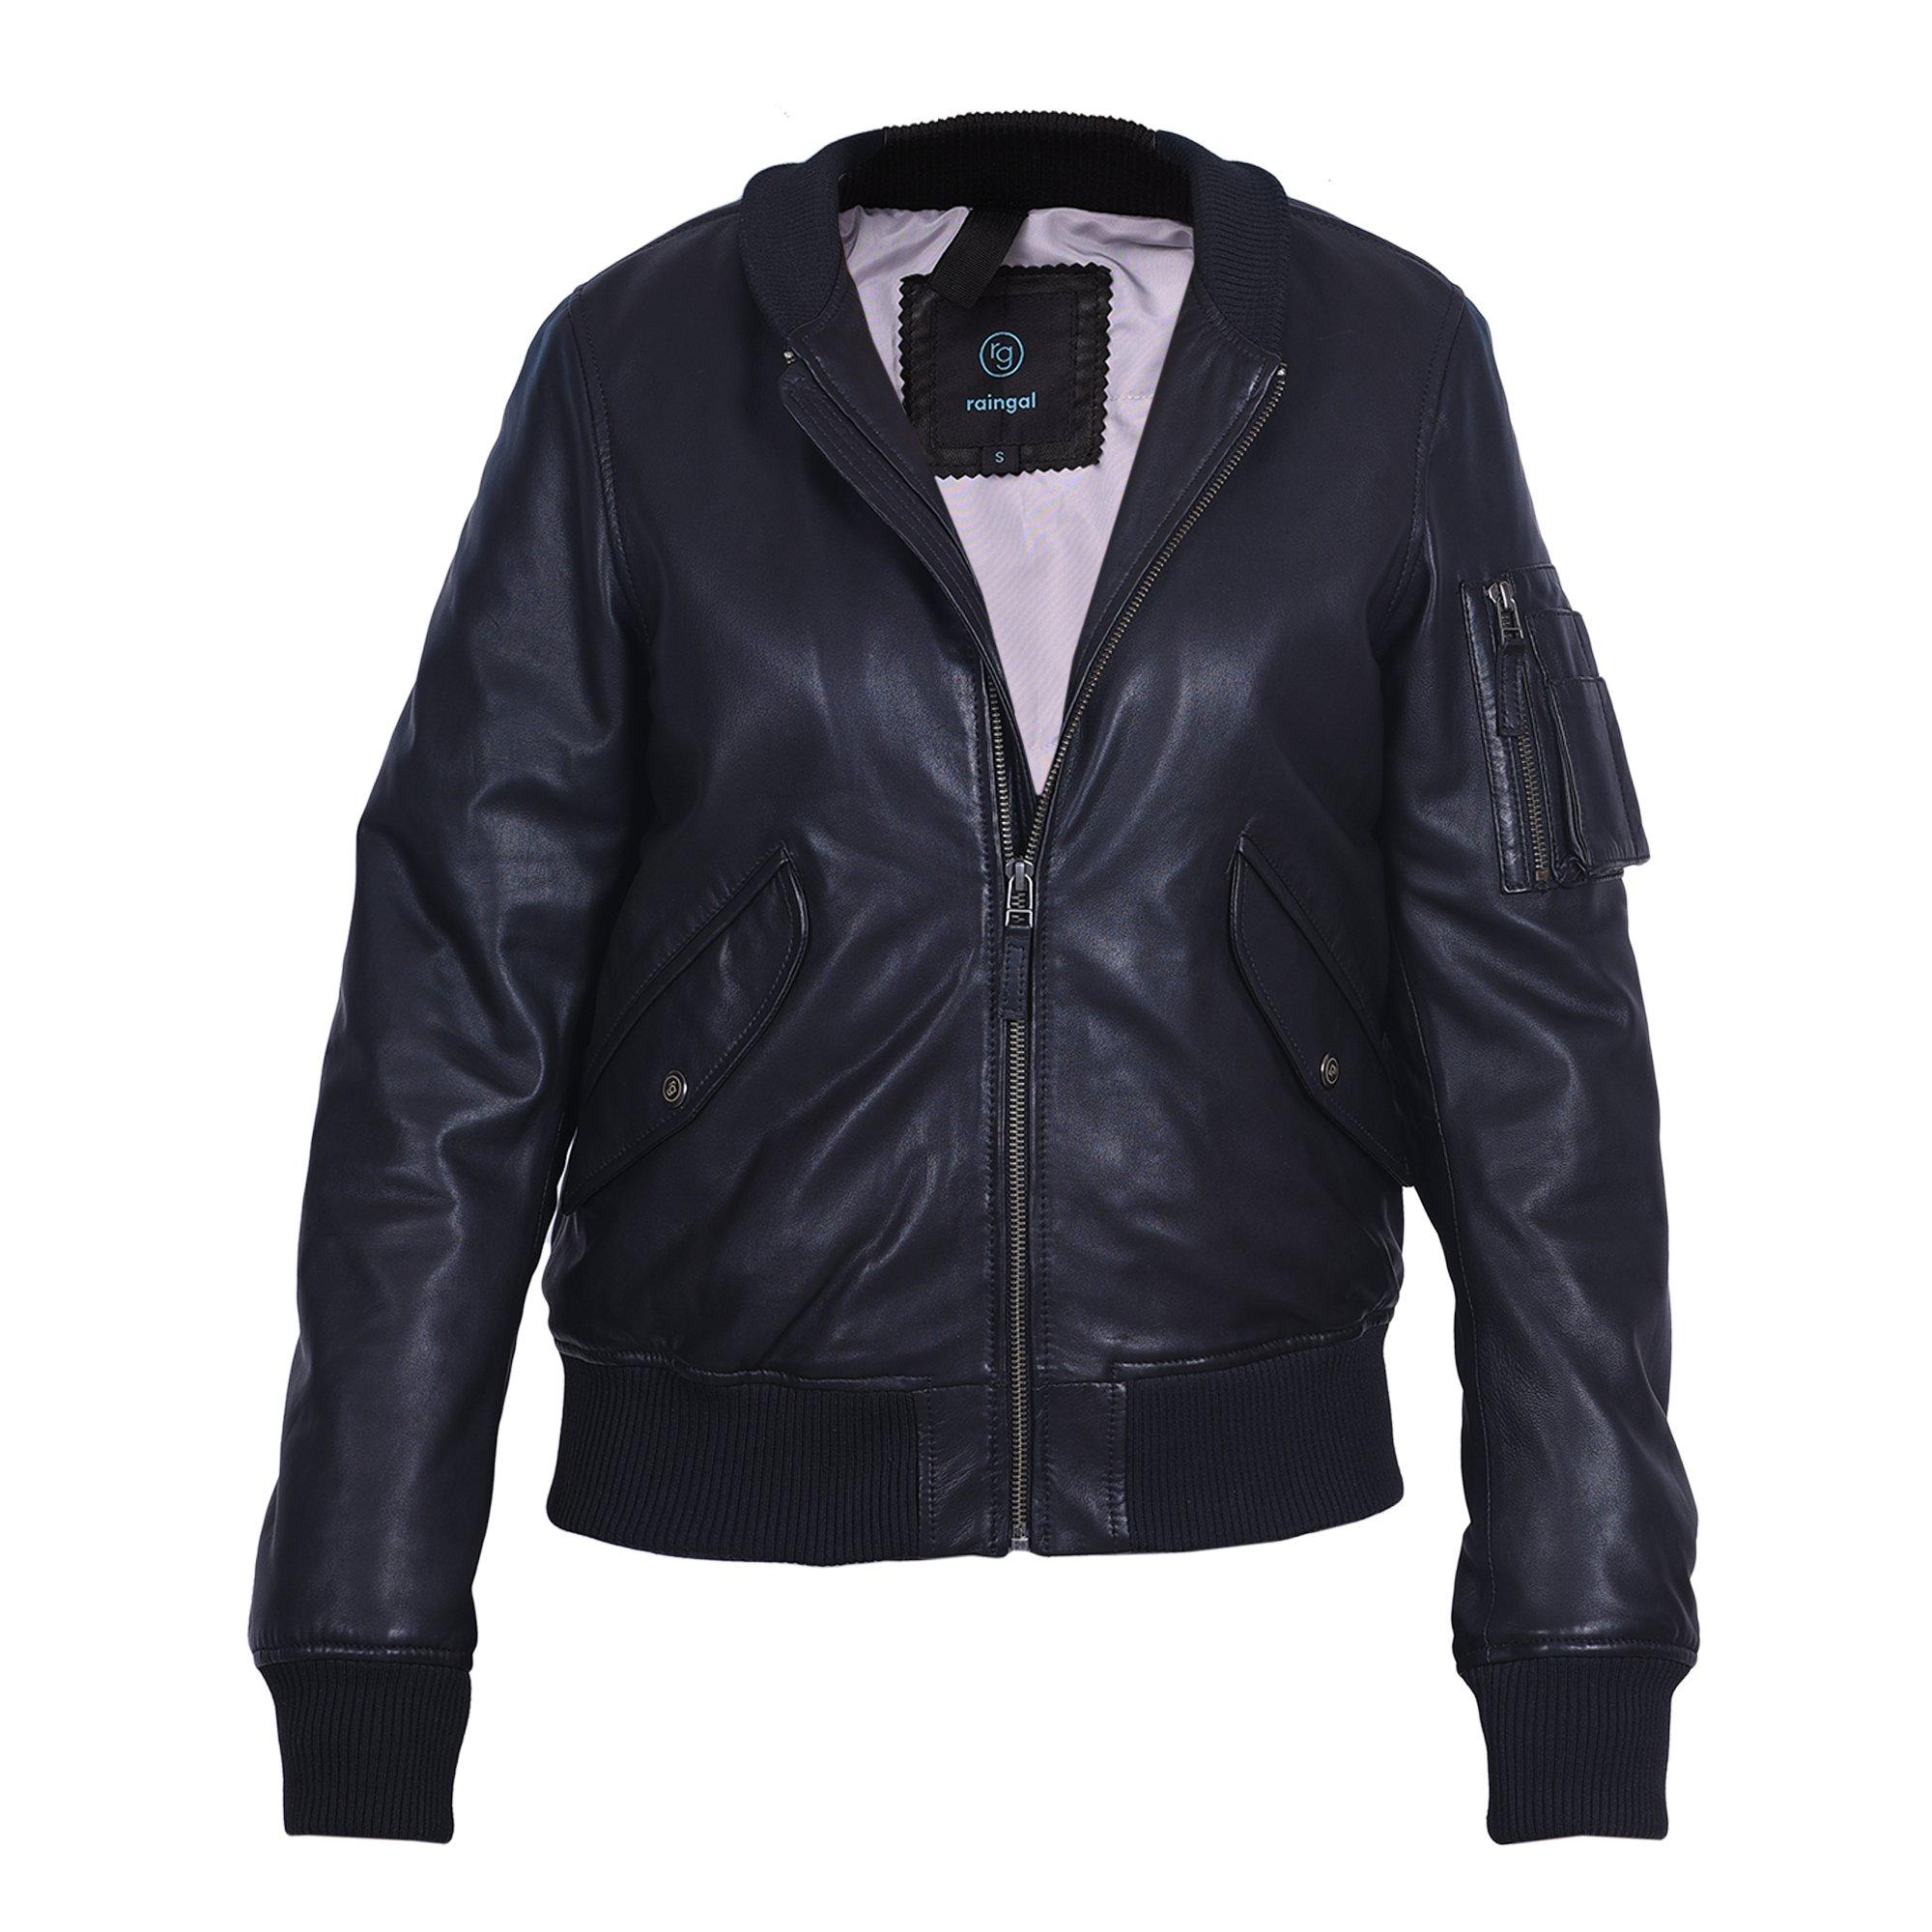 Bomber Jacket Women, 100% Lambskin Black Leather Jacket, Soft Luxury Feel, Relaxed Fit Womens Leather Jacket by raingal (Black)-Large